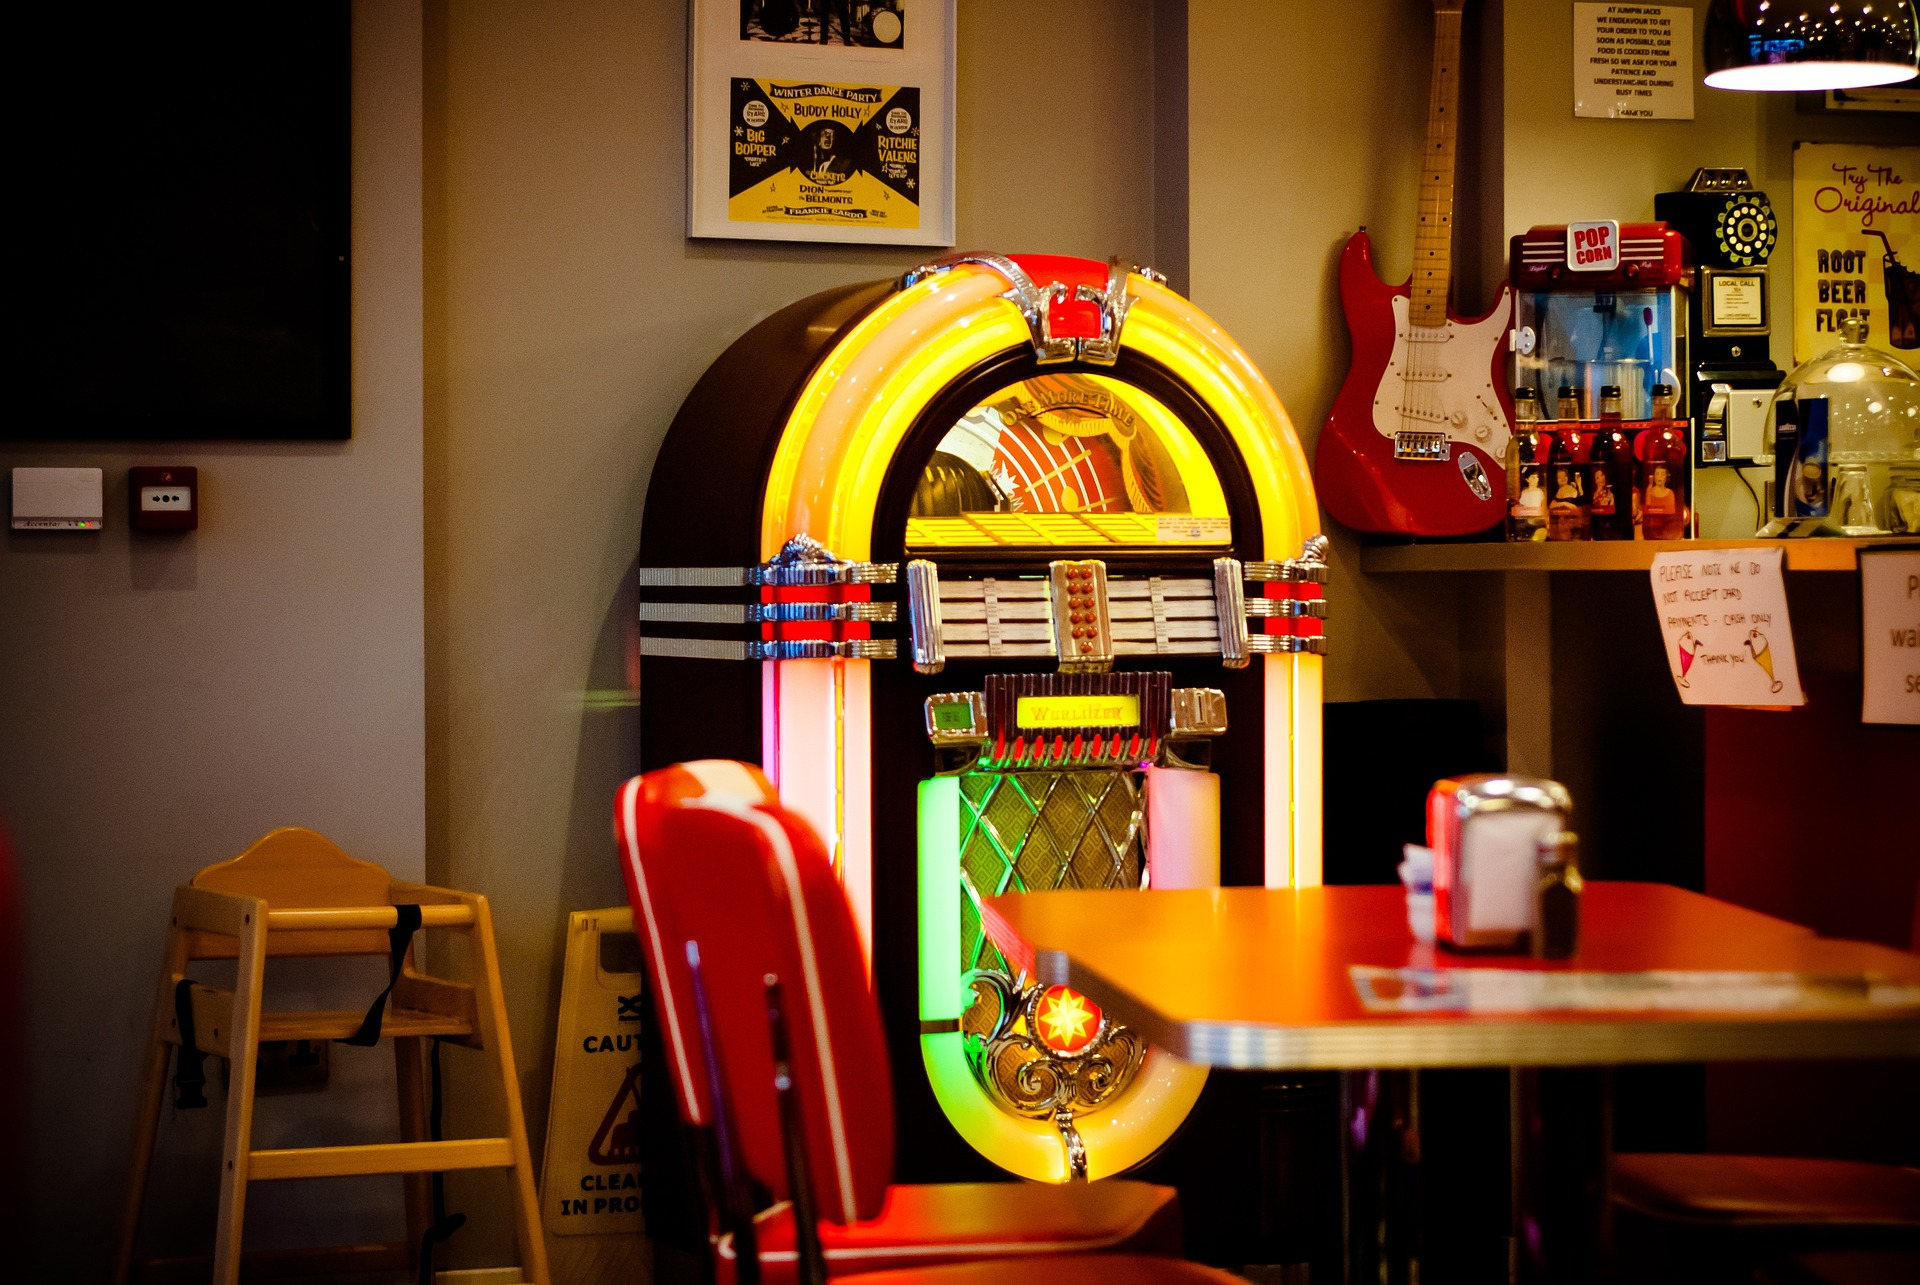 Jukebox im American Diner